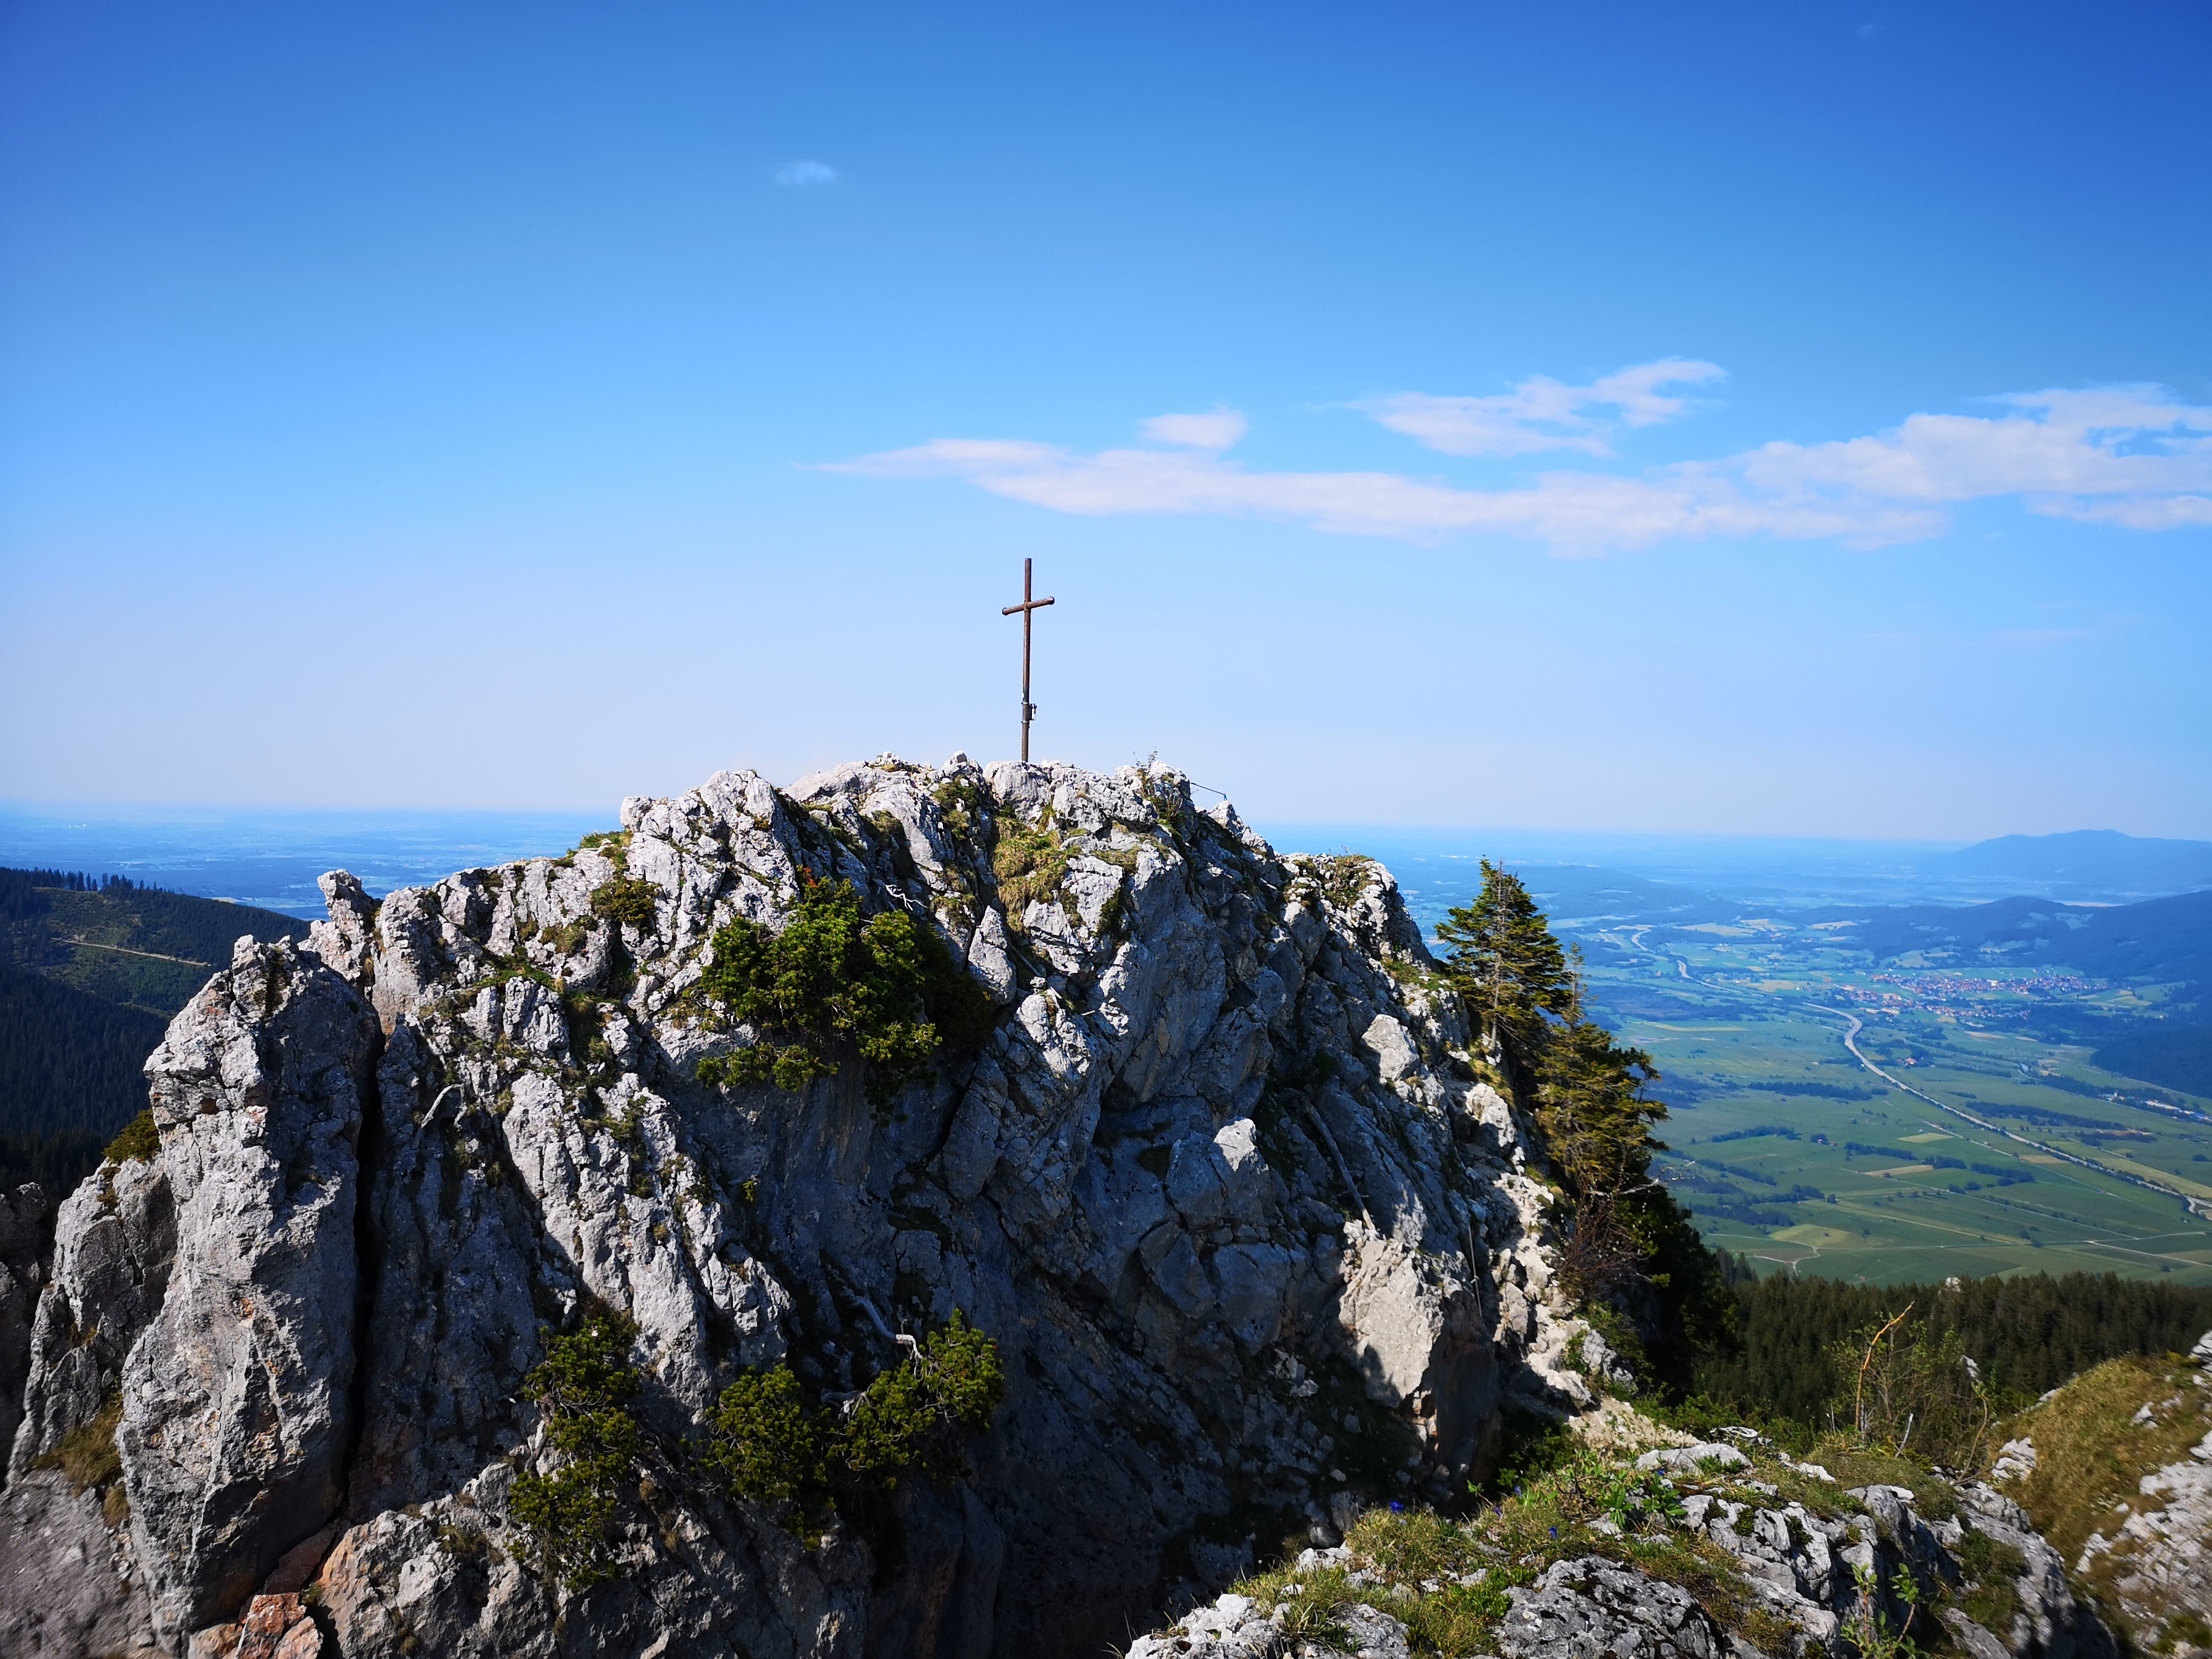 Bergtour - Ettaler Manndl - Gipfel